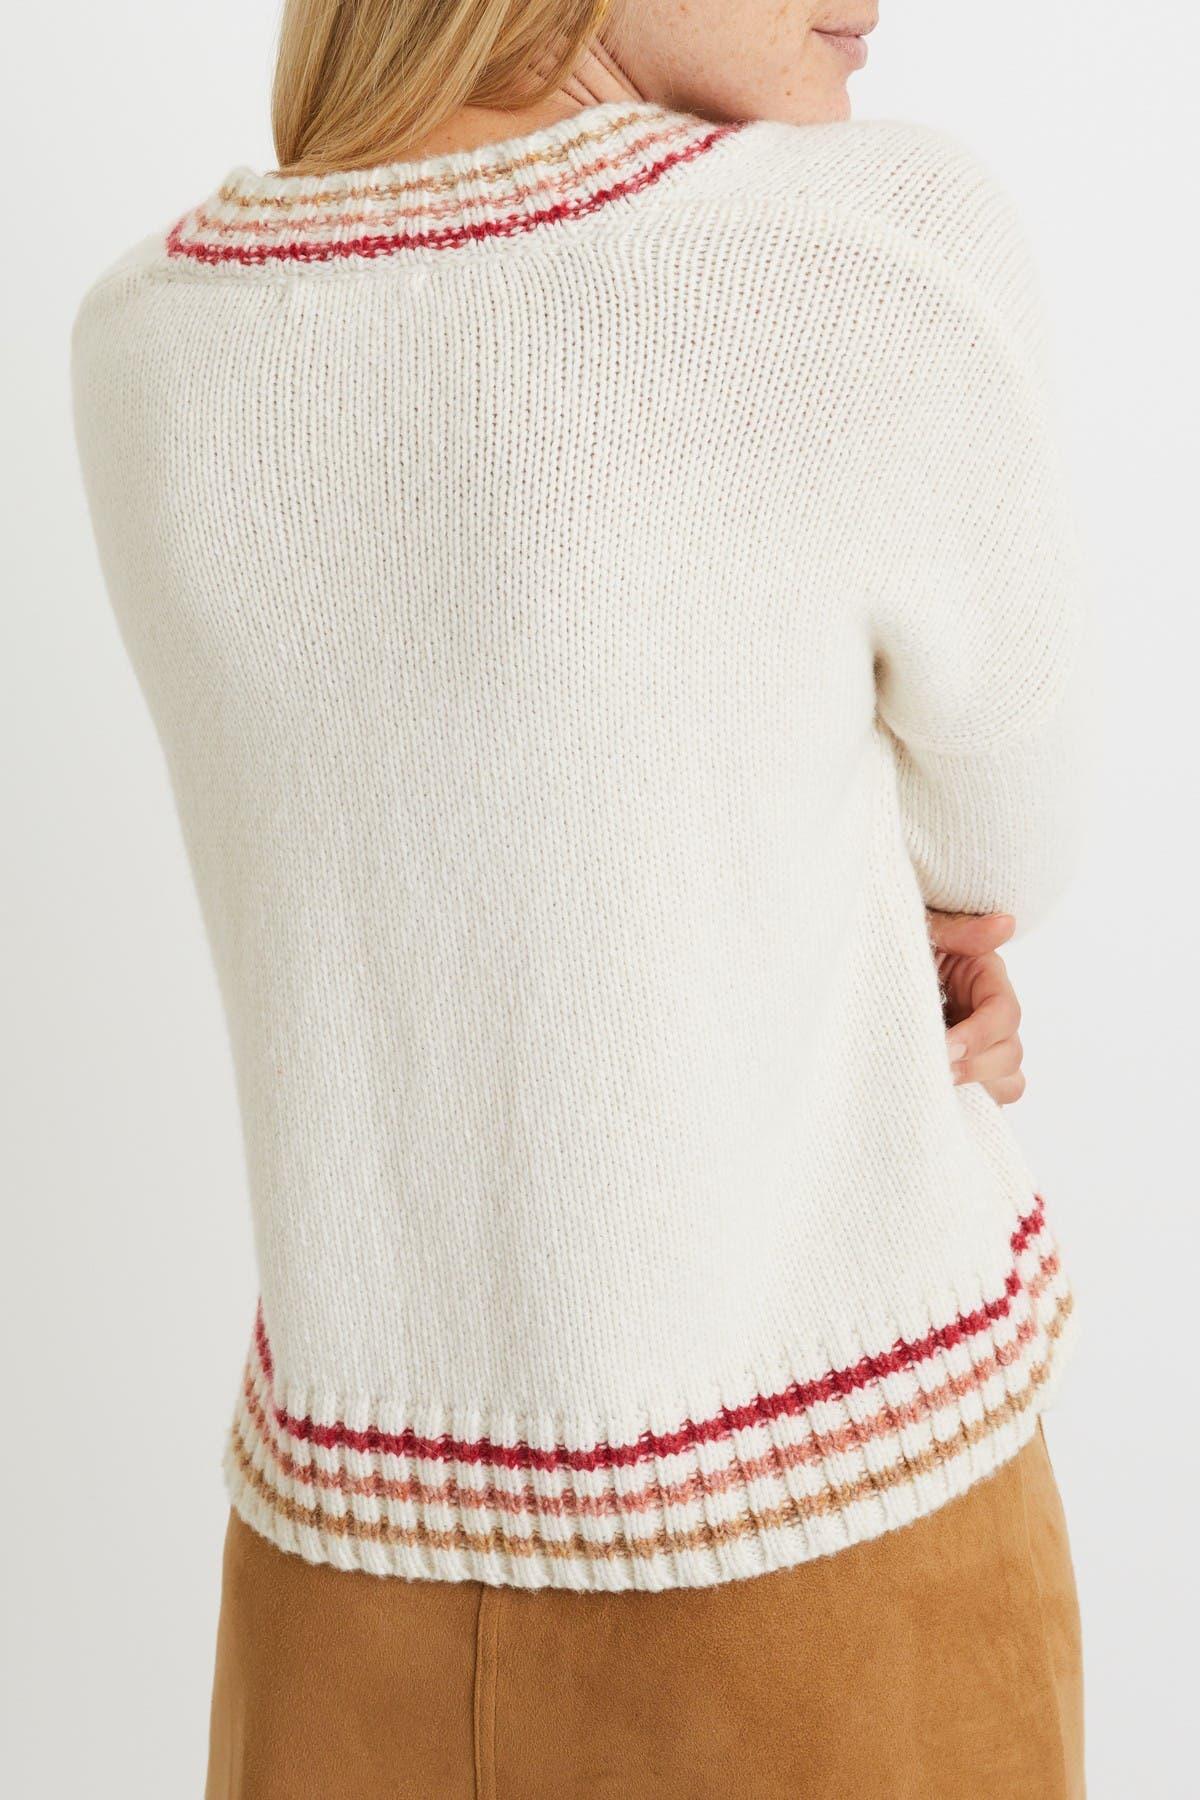 Image of Marine Layer Adalyn Stripe Trim V-Neck Sweater